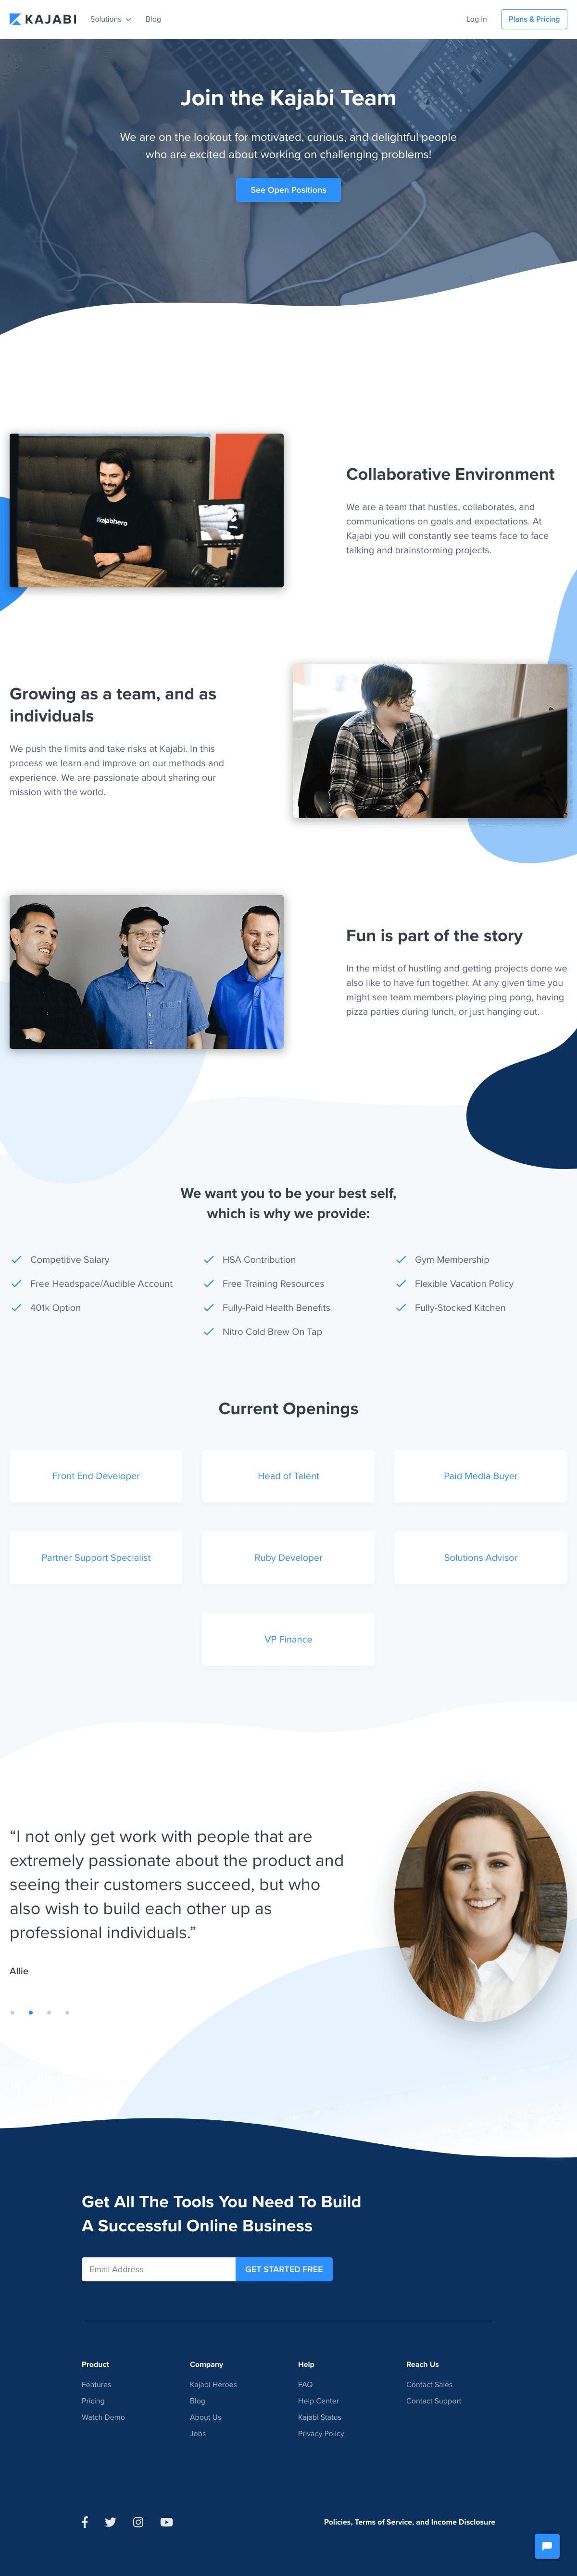 Kajabi - Career page